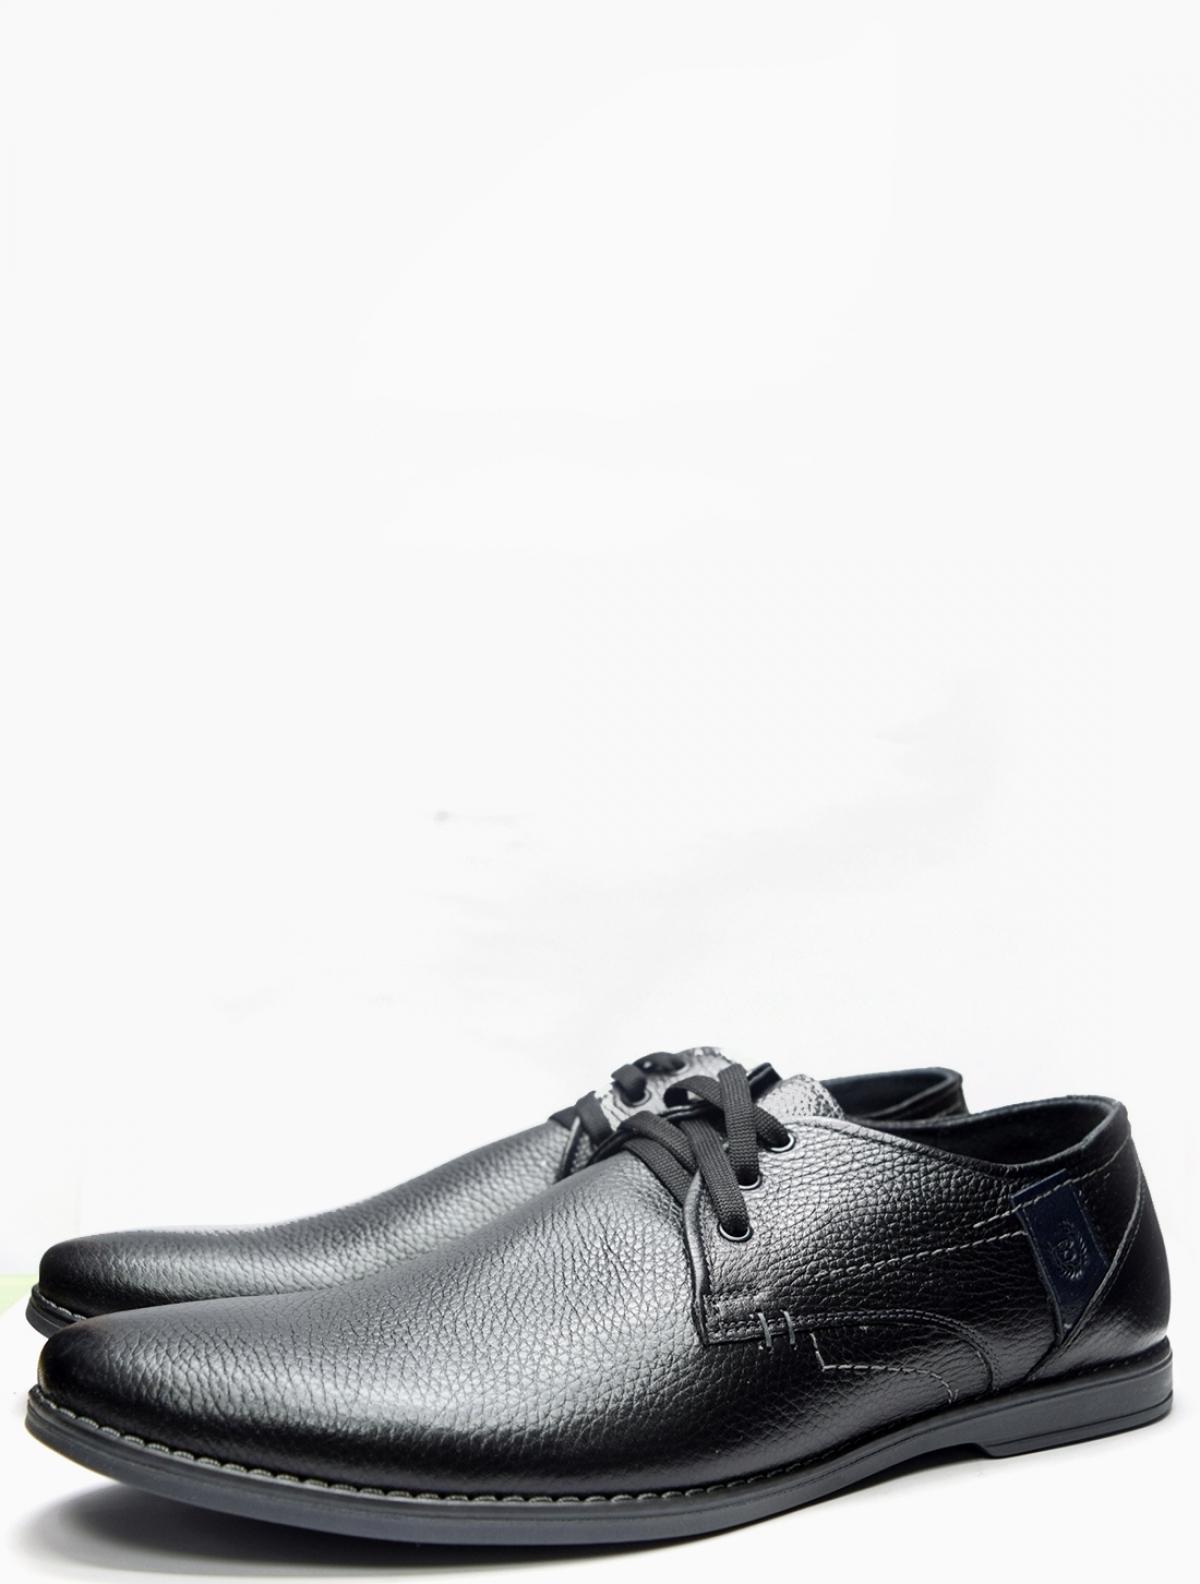 Belicci 542 мужские туфли